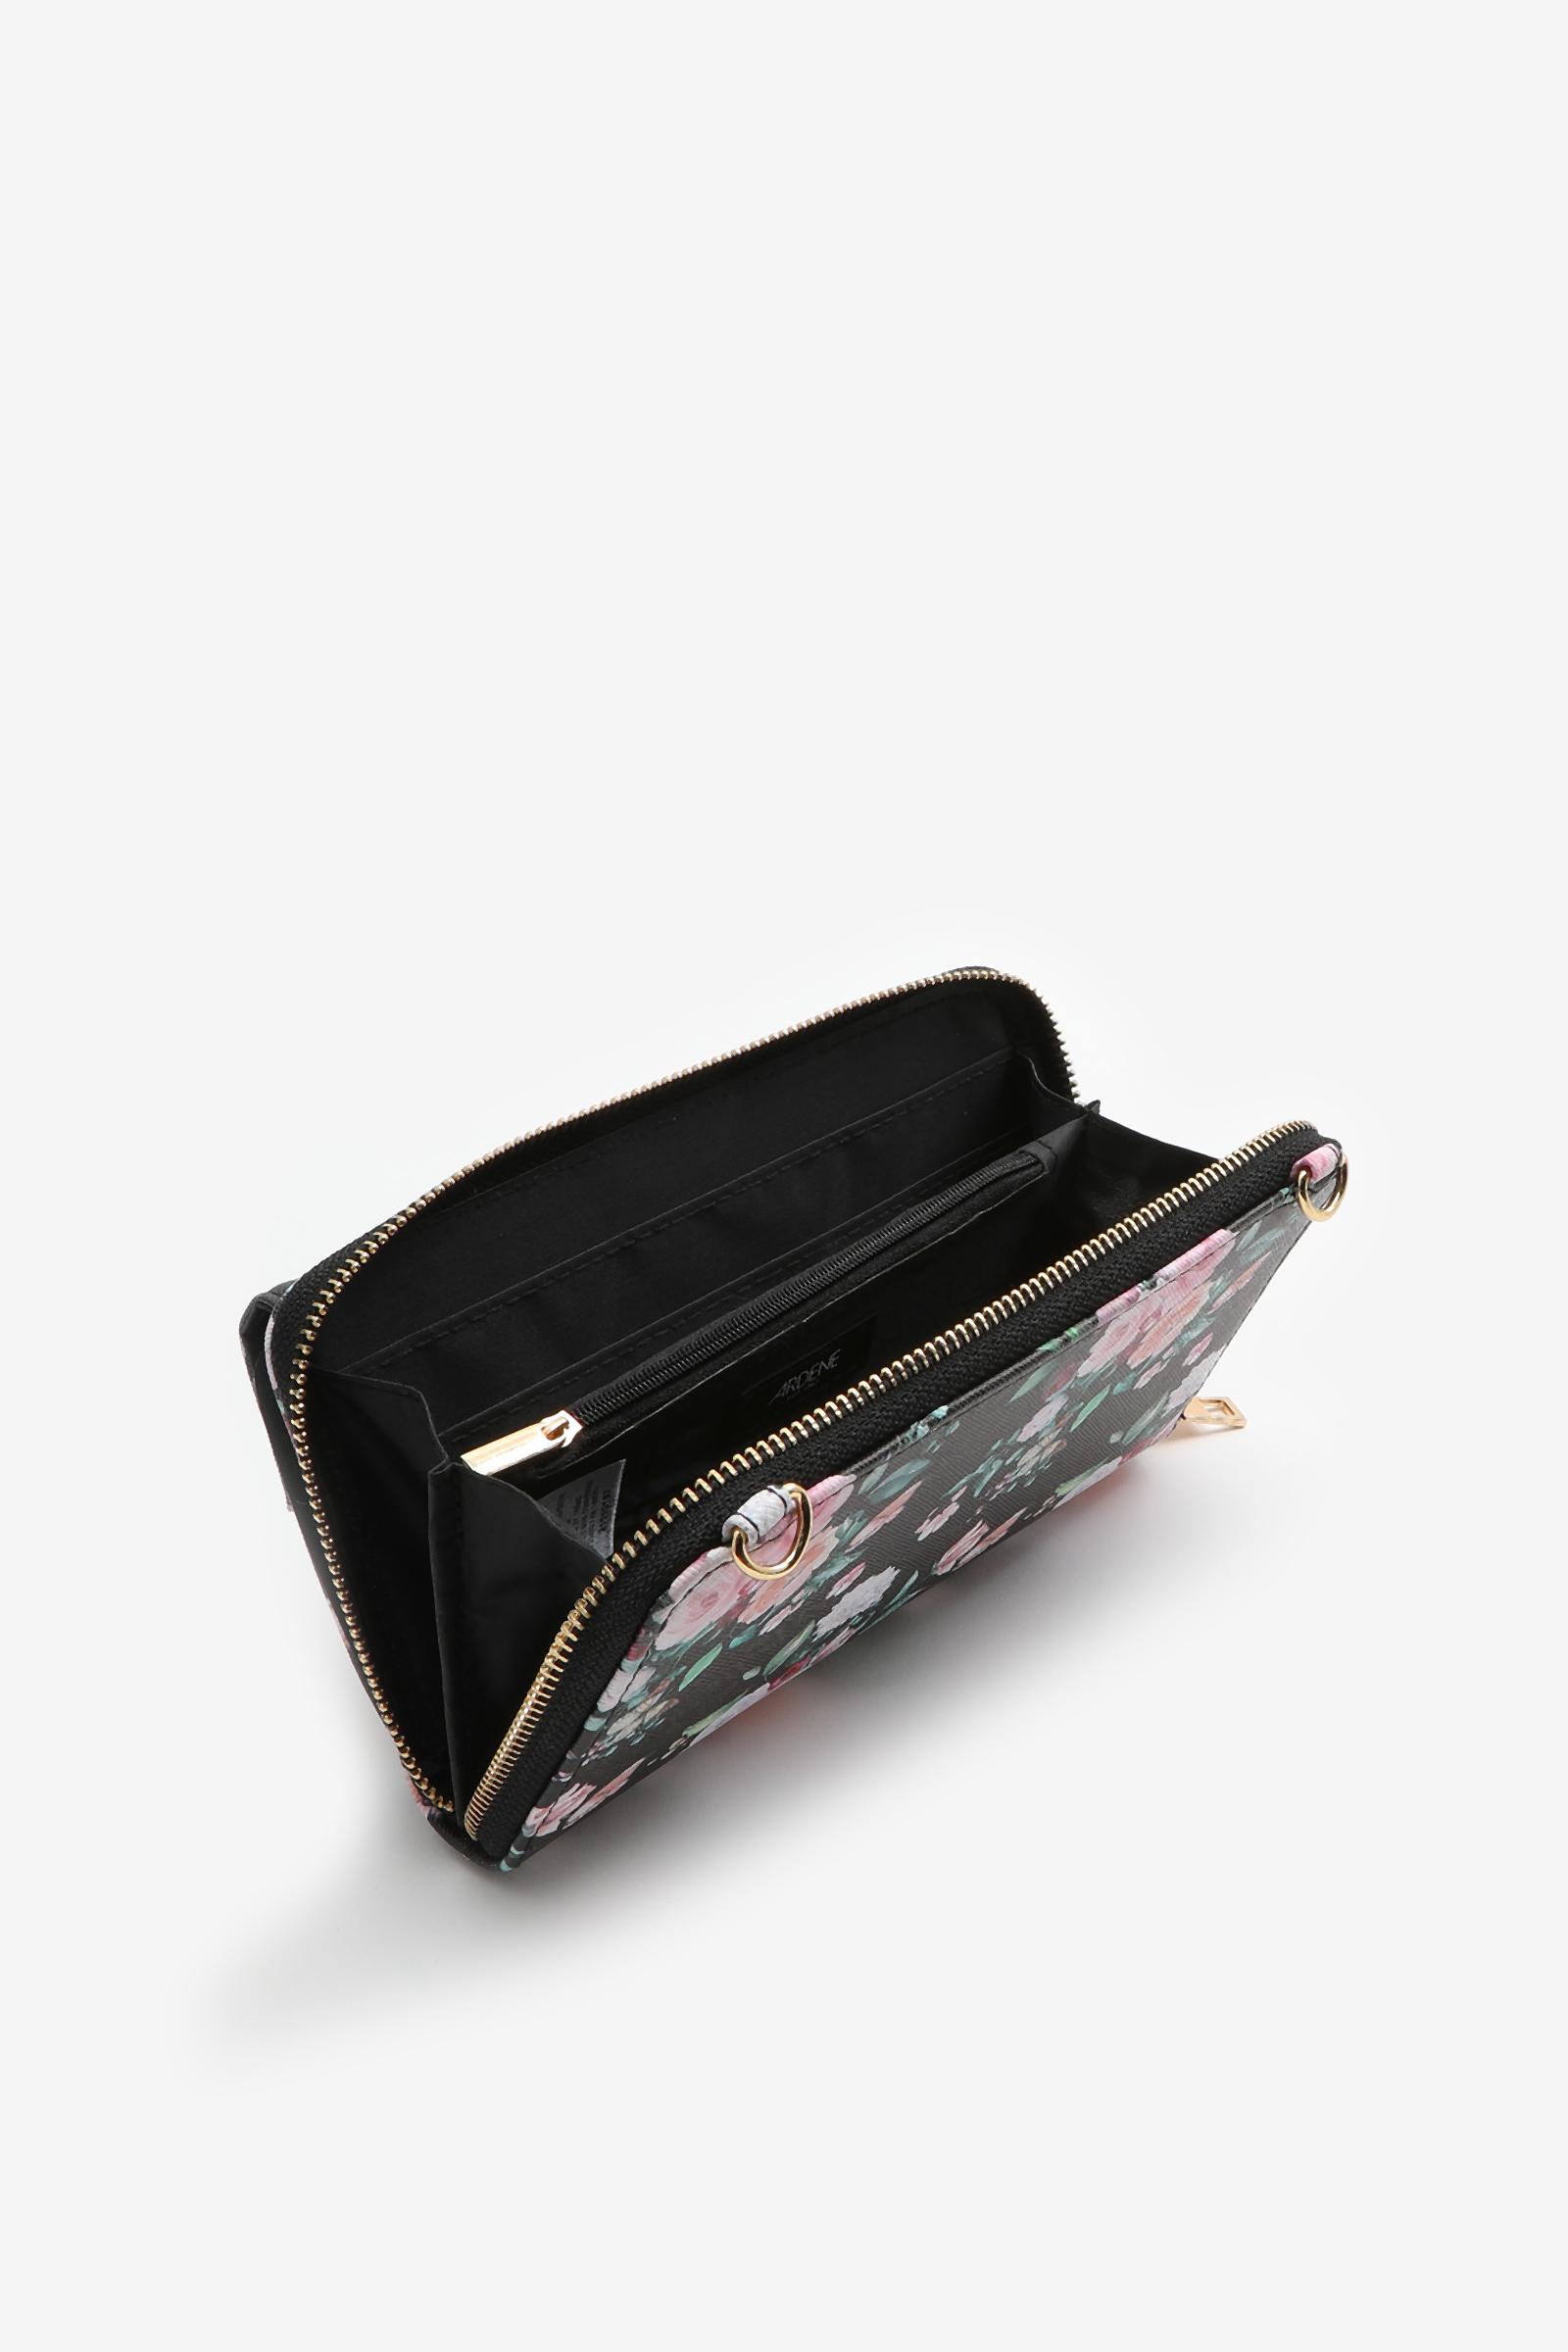 Turn-Lock Floral Clutch Wallet